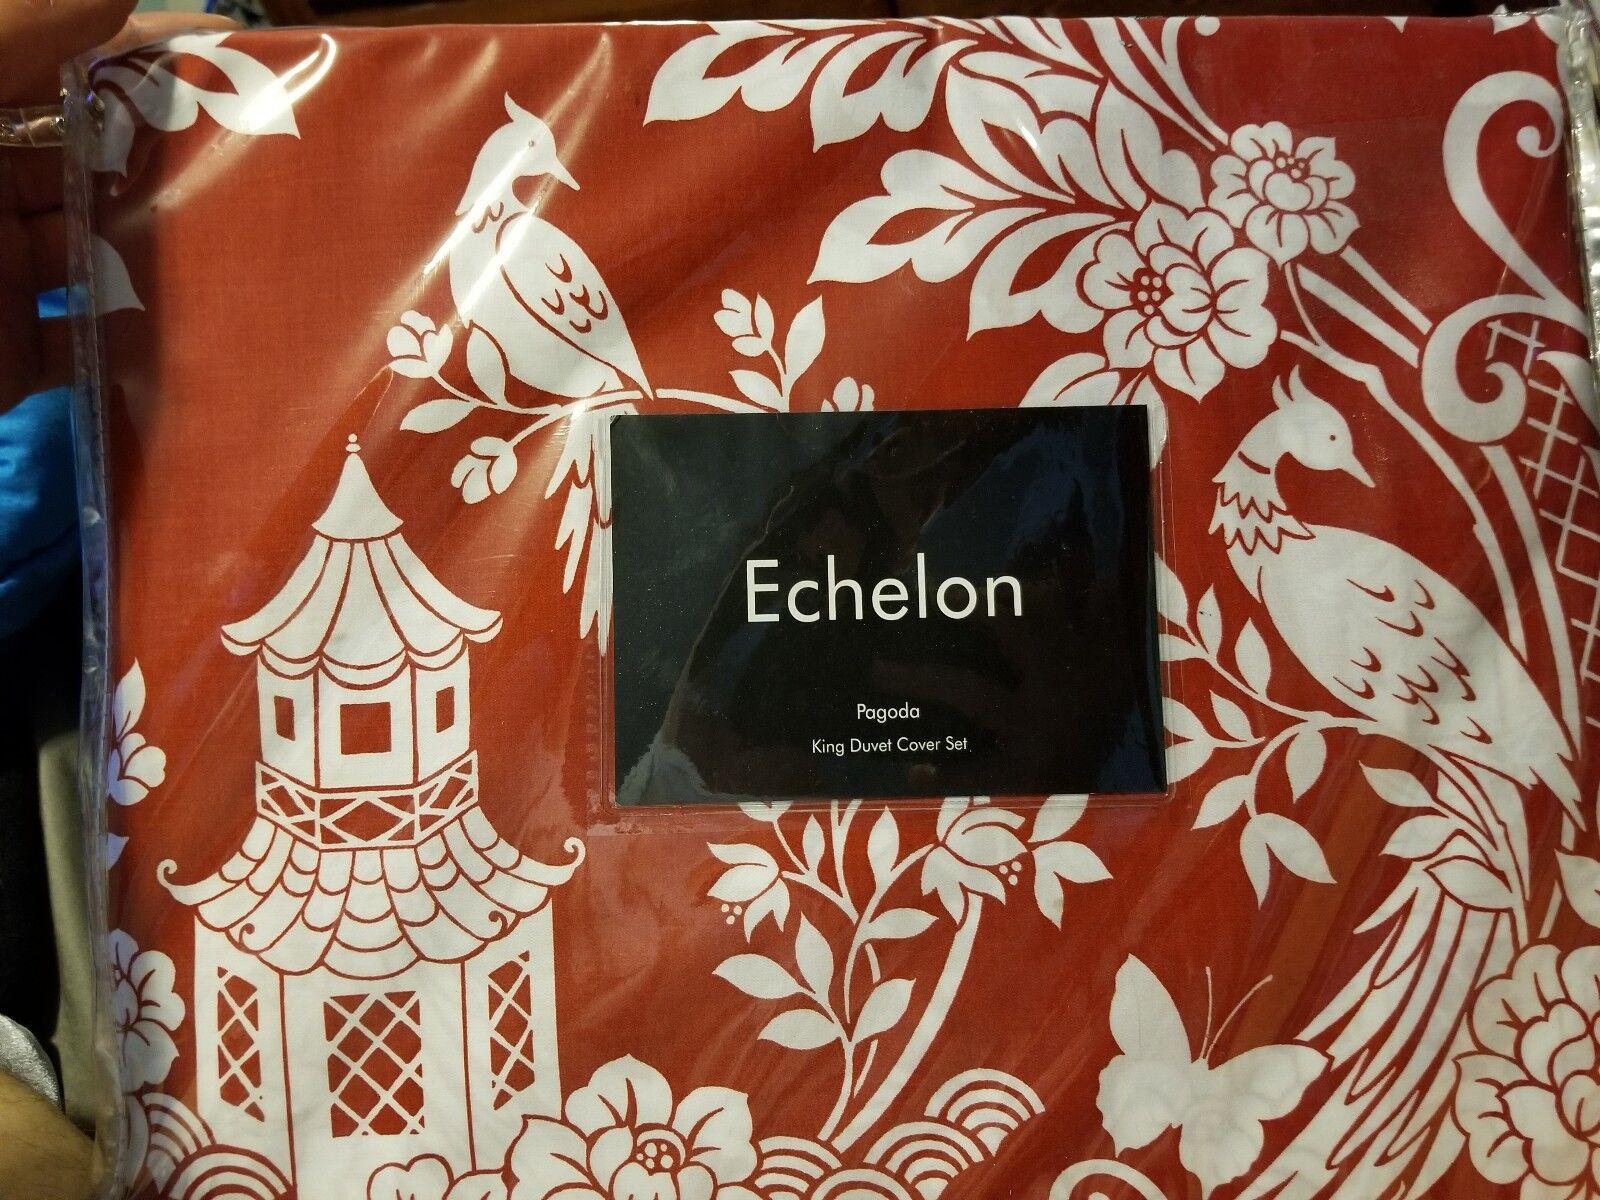 Echelon Pagoda King Duvet Cover Set, Cinnabar